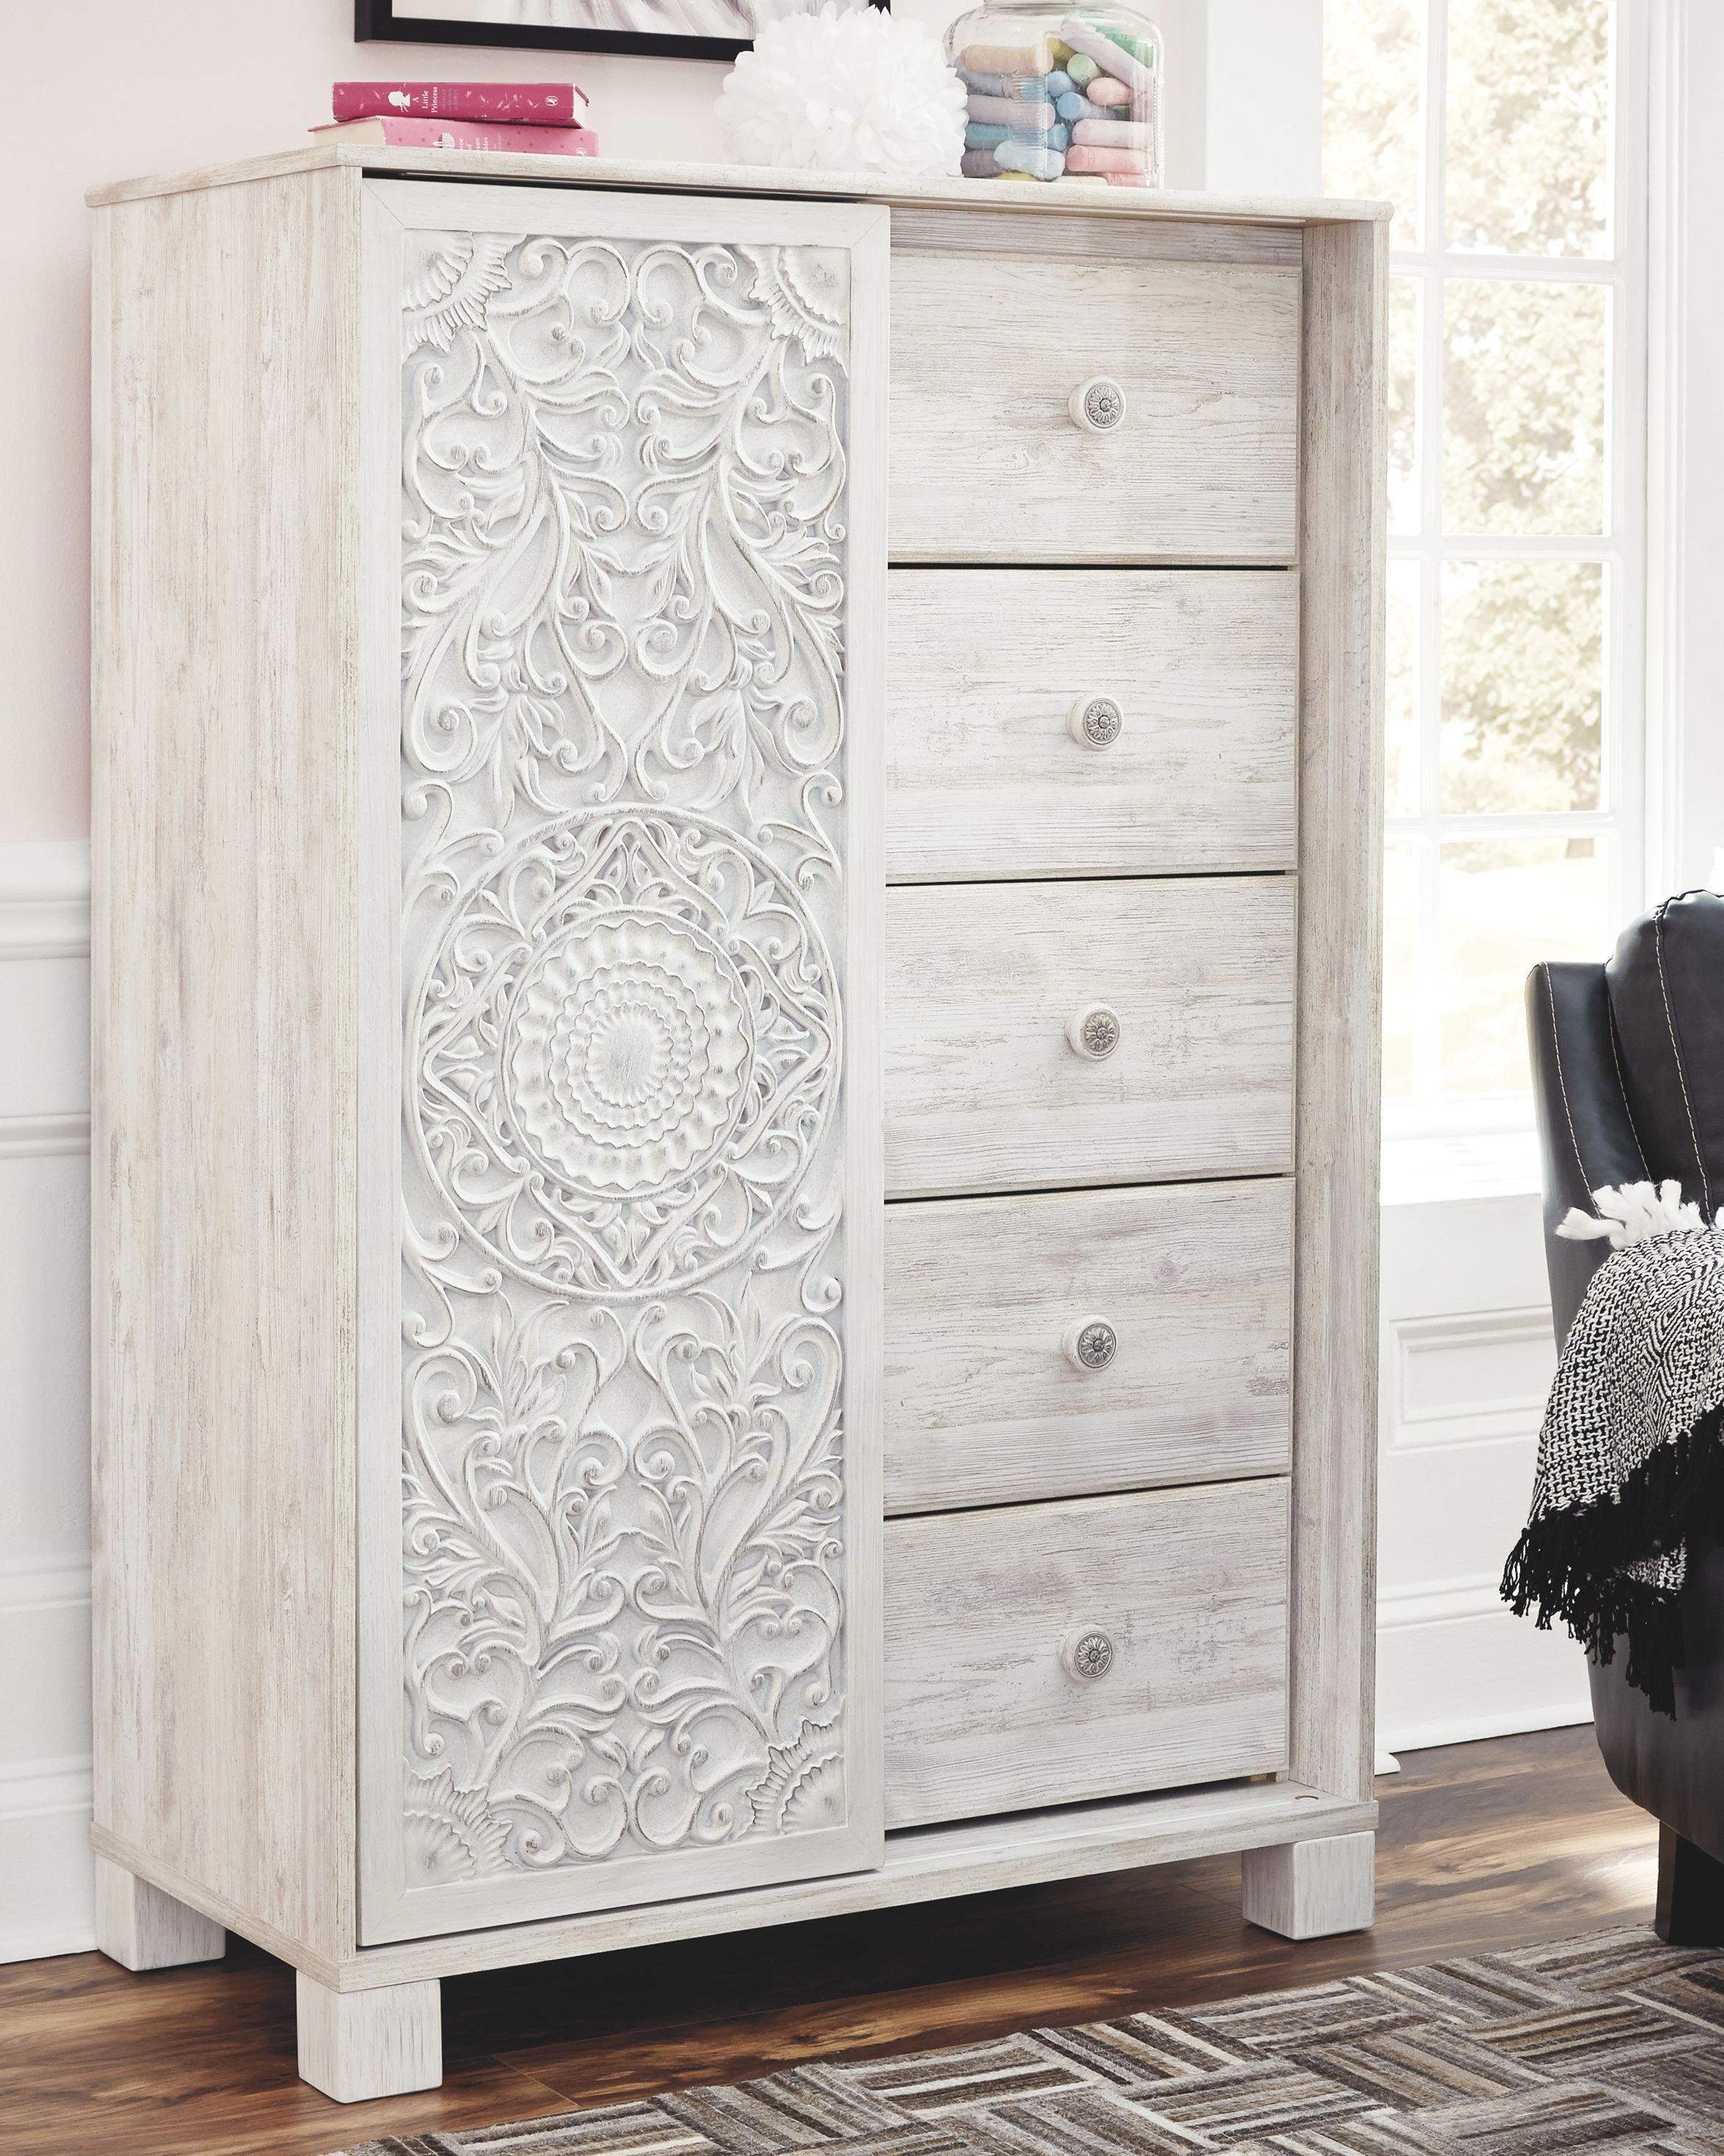 Paxberry Dressing Chest, Whitewash homelivingroomdecor in